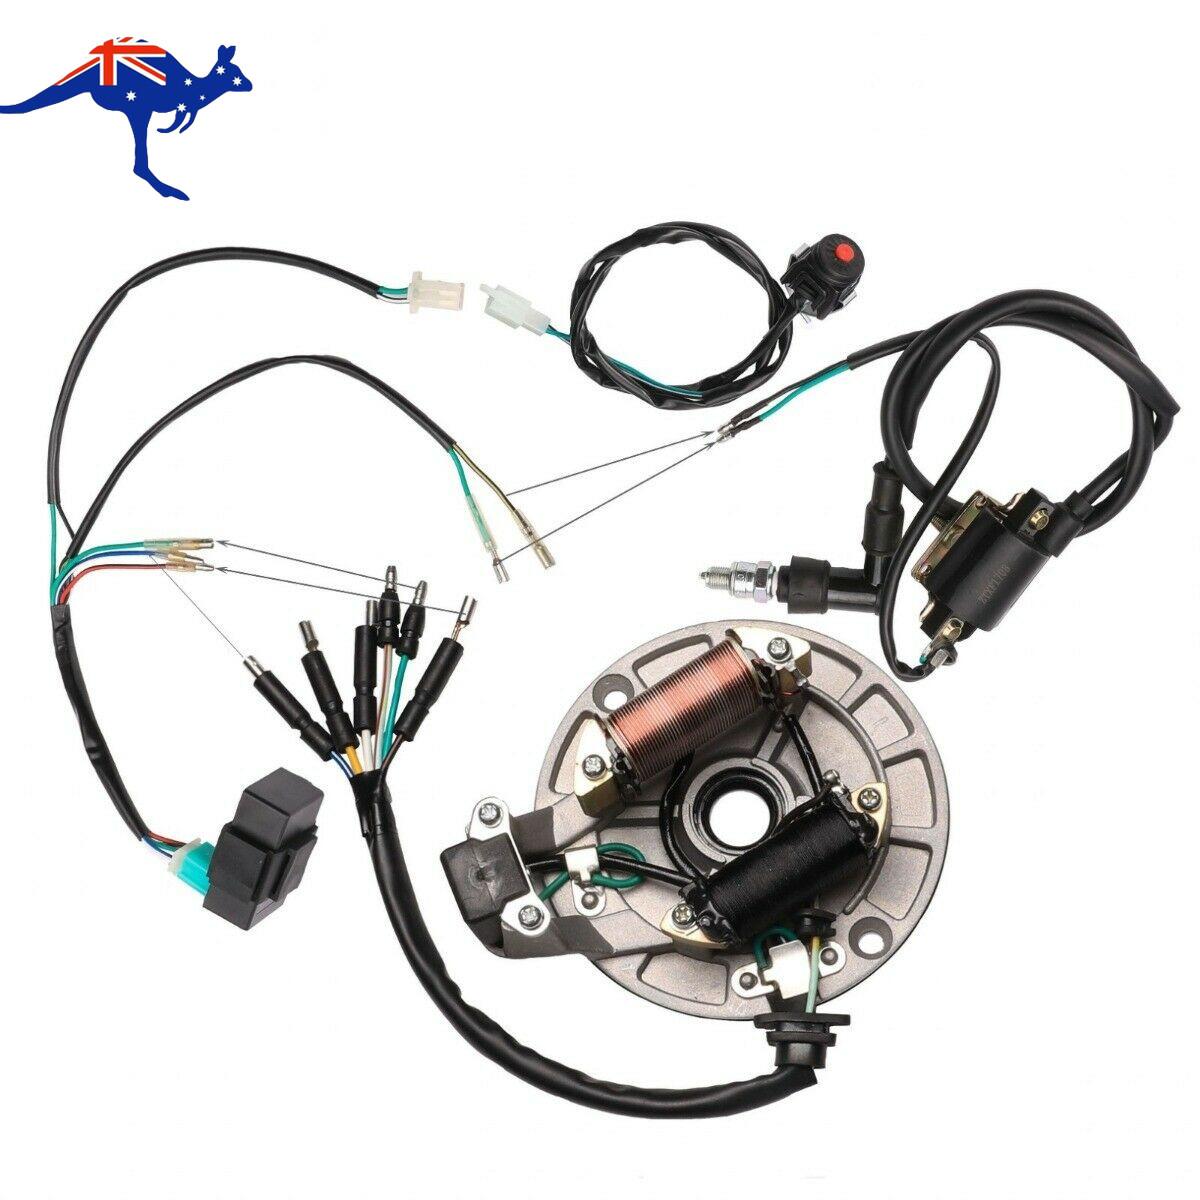 Kick Start Wiring Harness Cdi Coil Magneto Stator For Dirt Bike Lifan 50